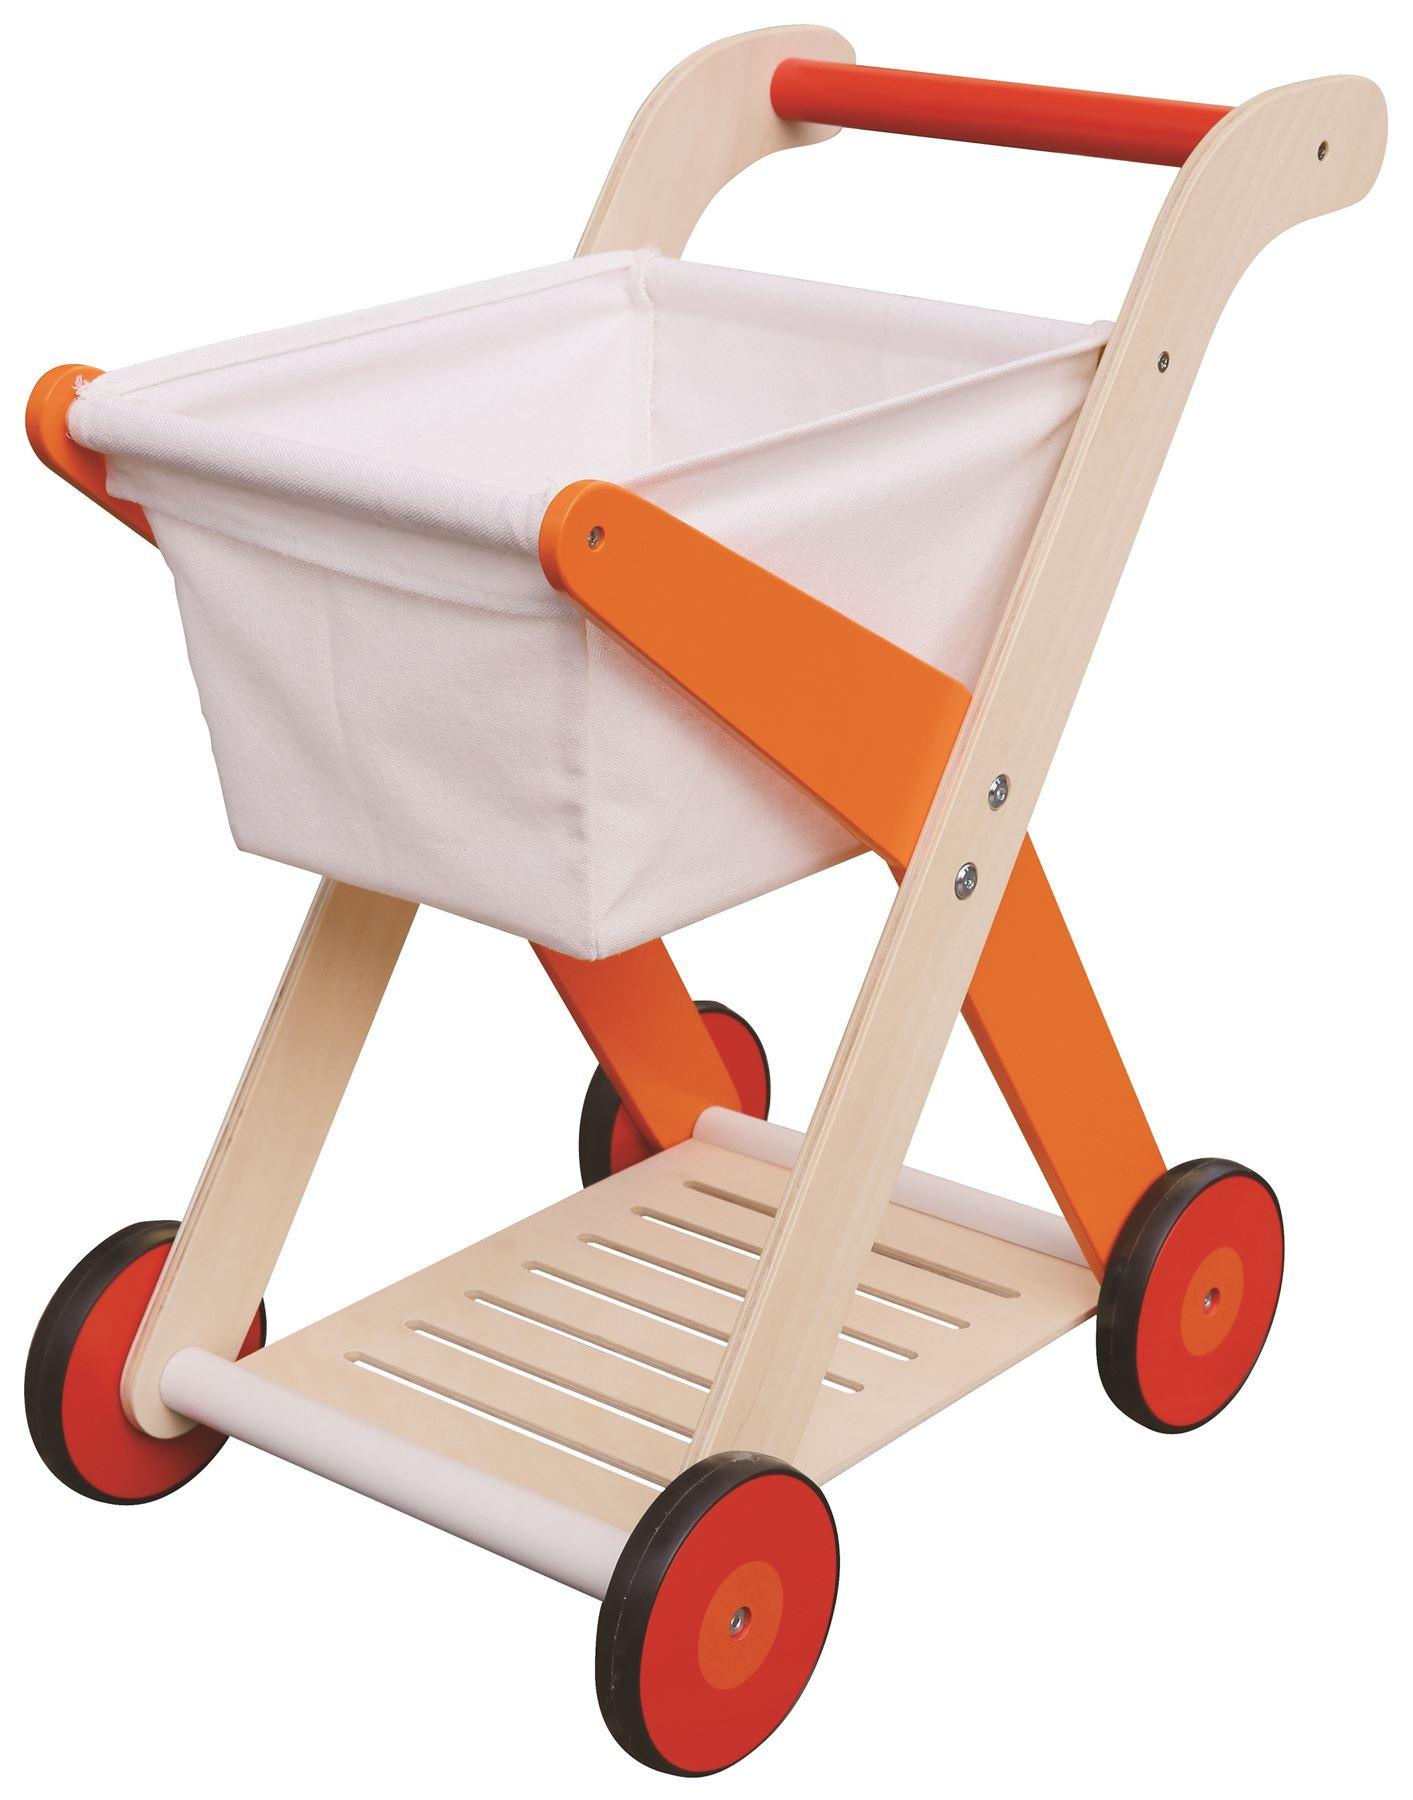 lelin children kids wood wooden shopping trolley cart pretend play toy ebay. Black Bedroom Furniture Sets. Home Design Ideas